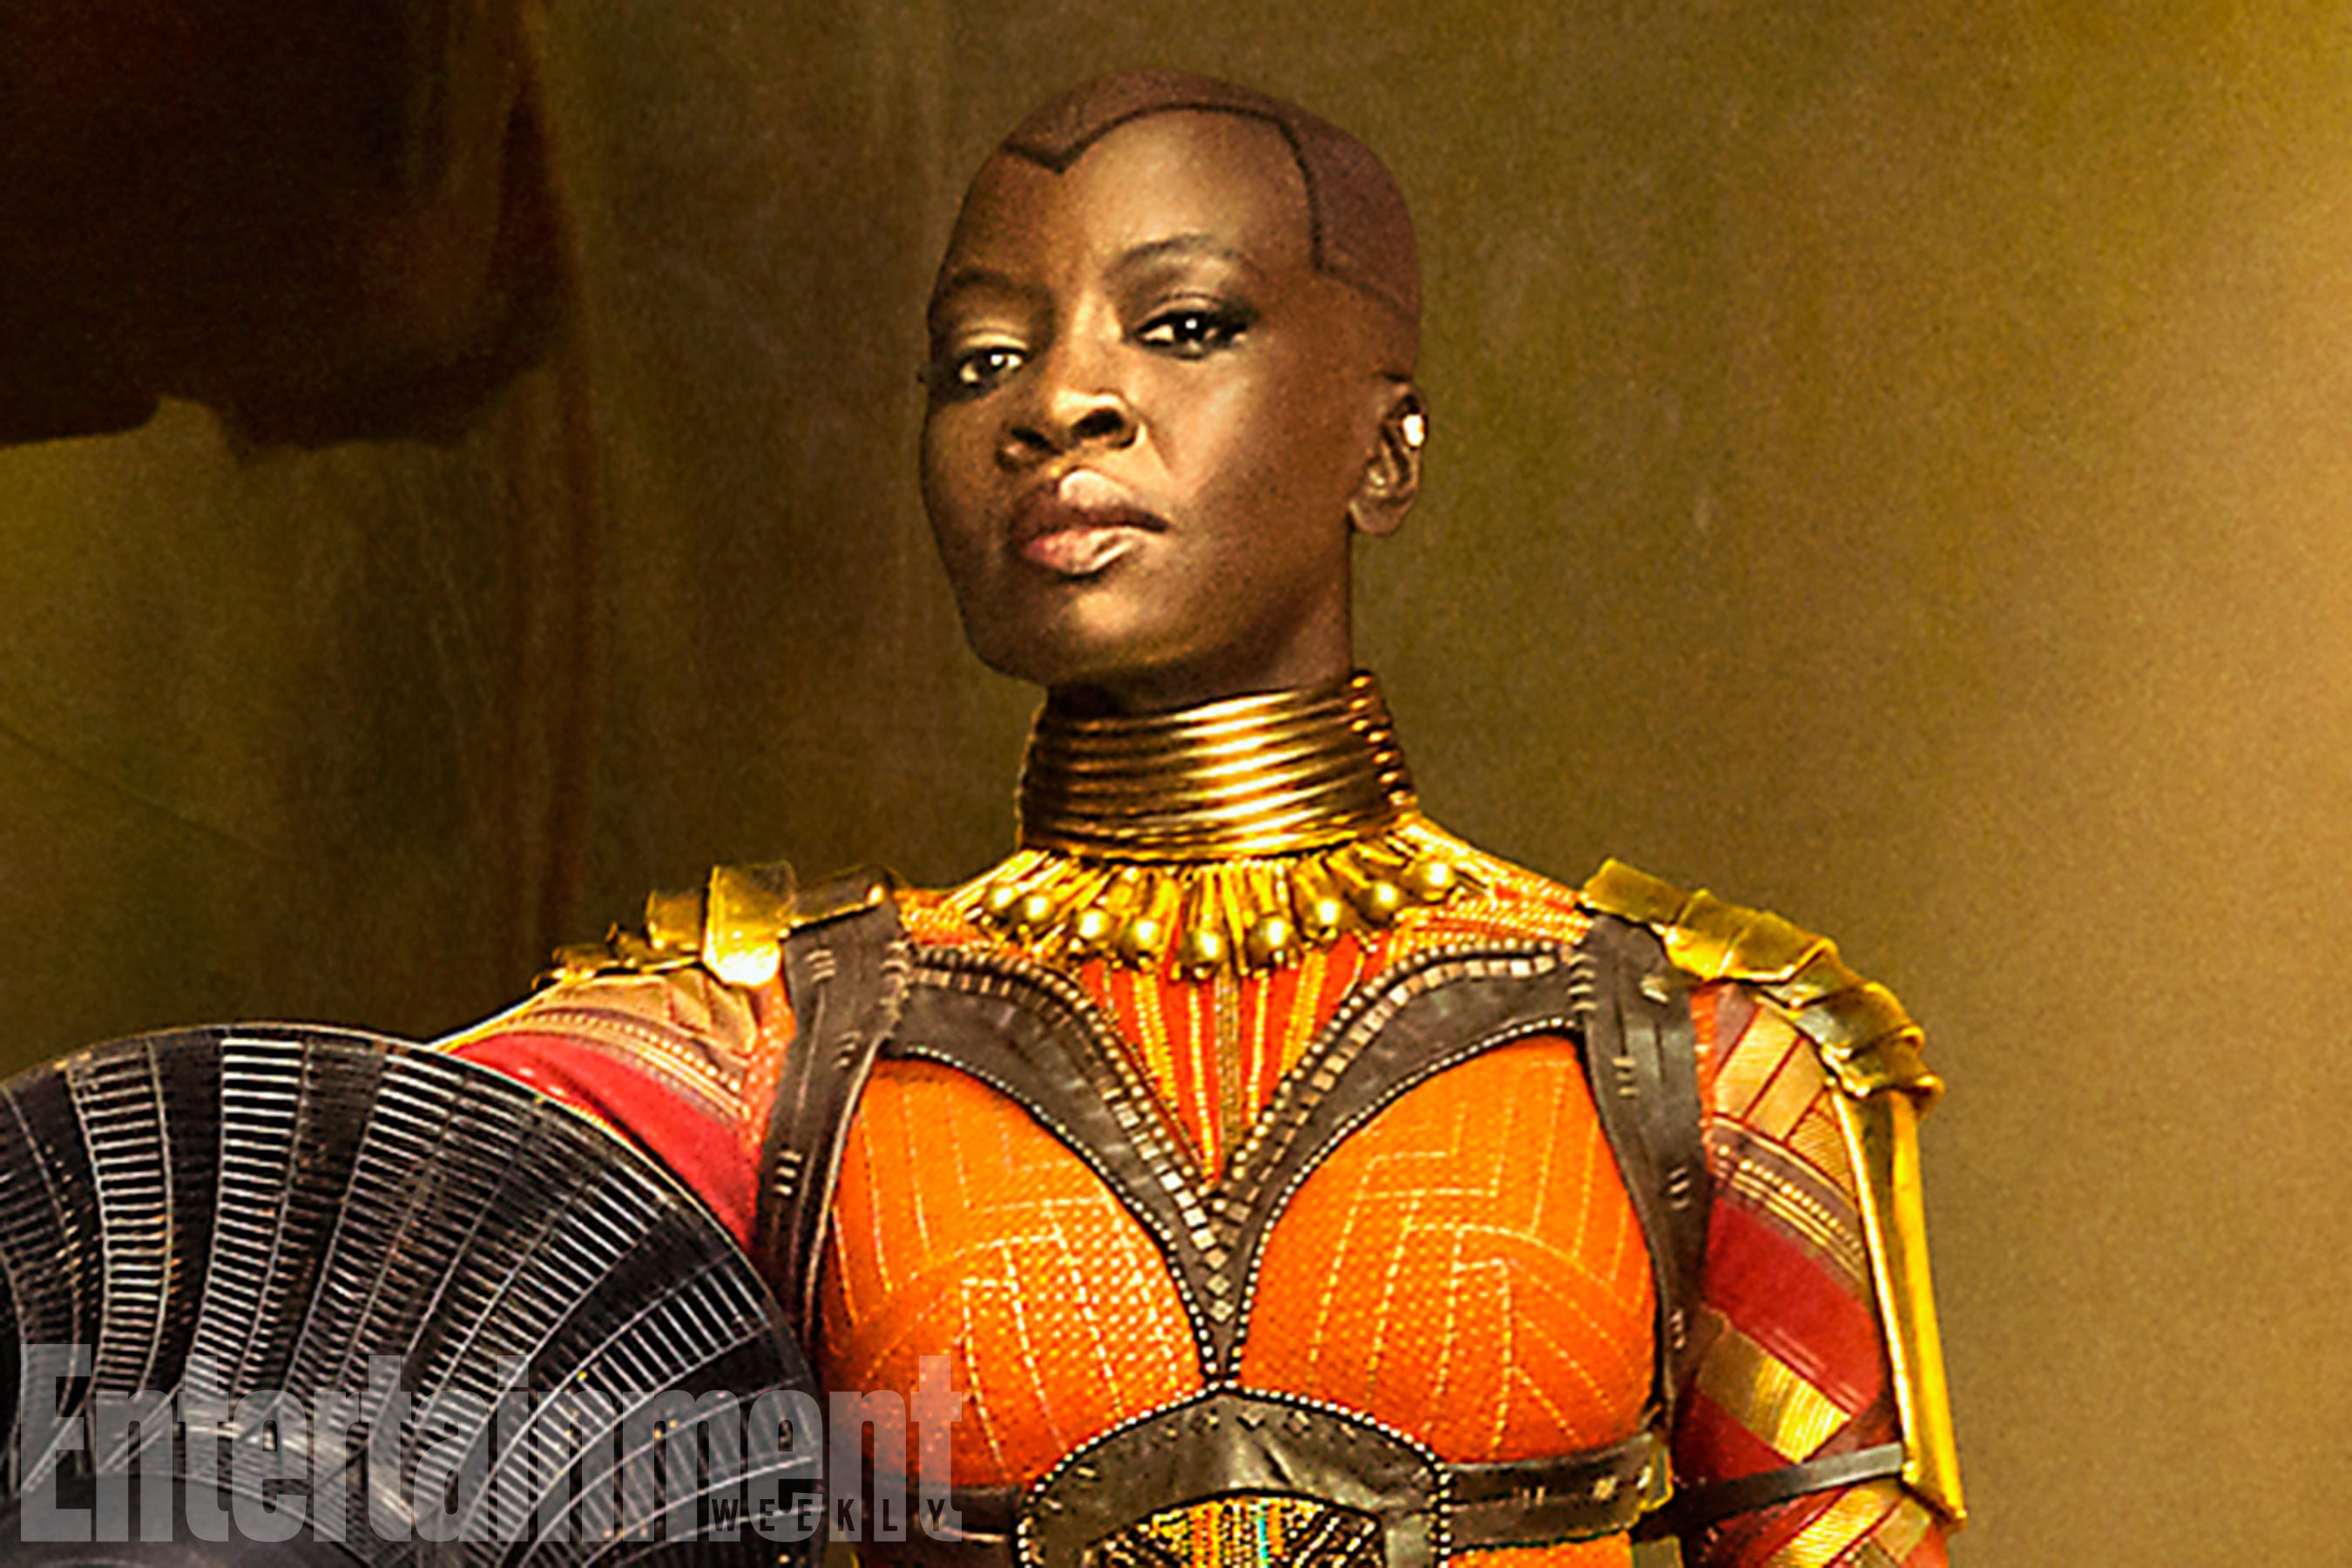 Pictured Danai Gurira as Okoye. Image via Entertainment Weekly  sc 1 st  Black Girl Nerds & 6 Last Minute Halloween Costume Ideas - Black Girl Nerds